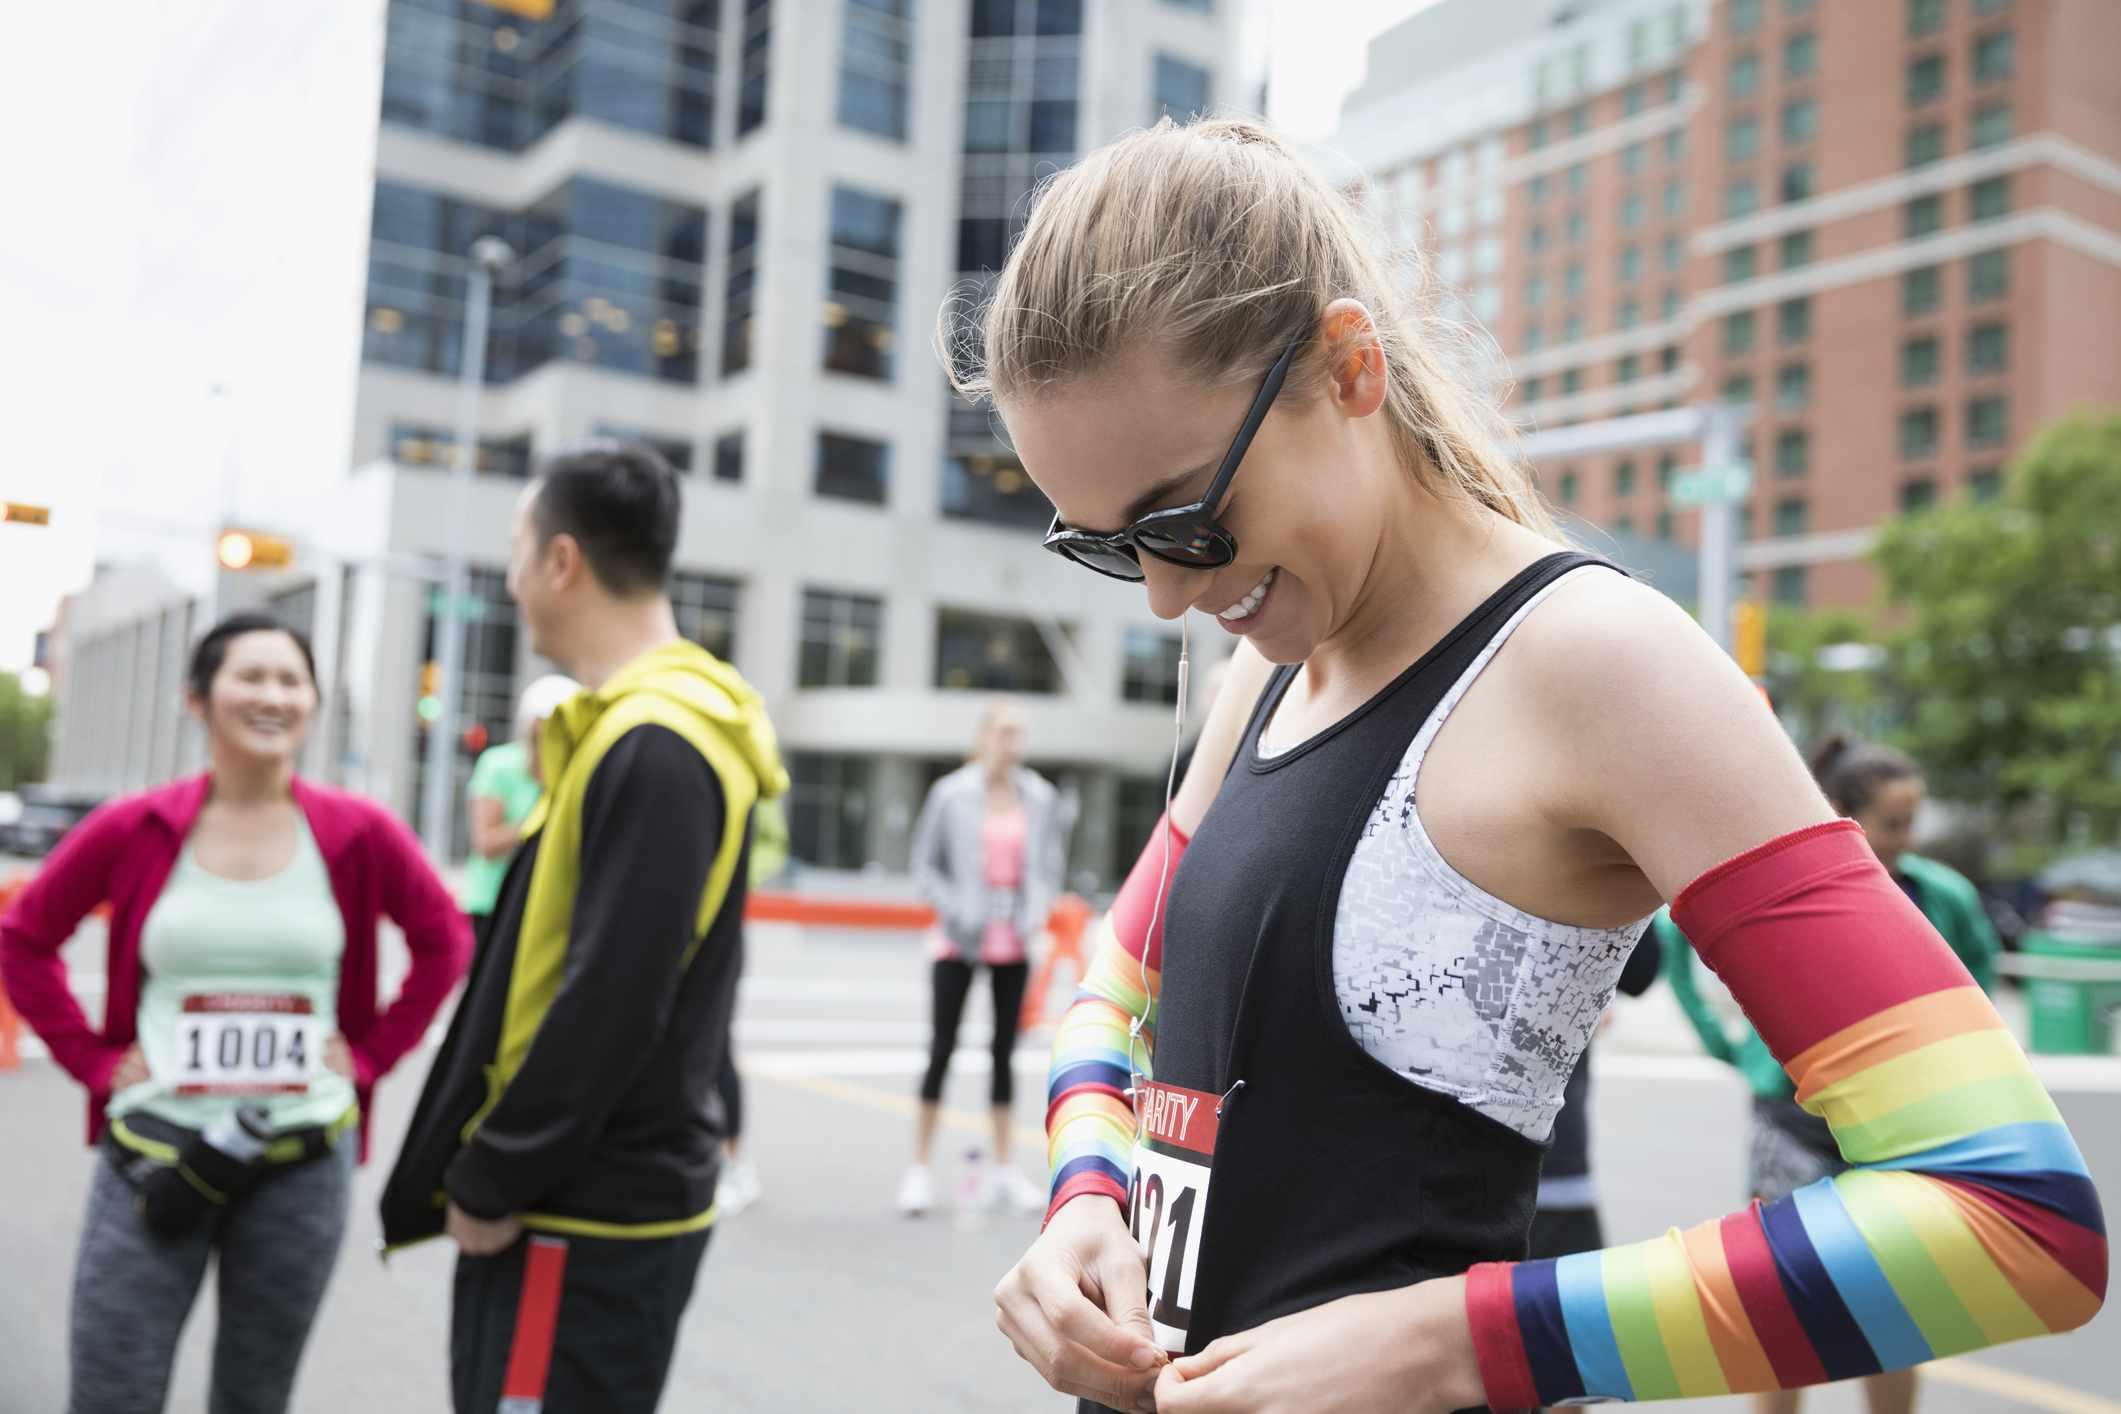 marathon runners preparing for race